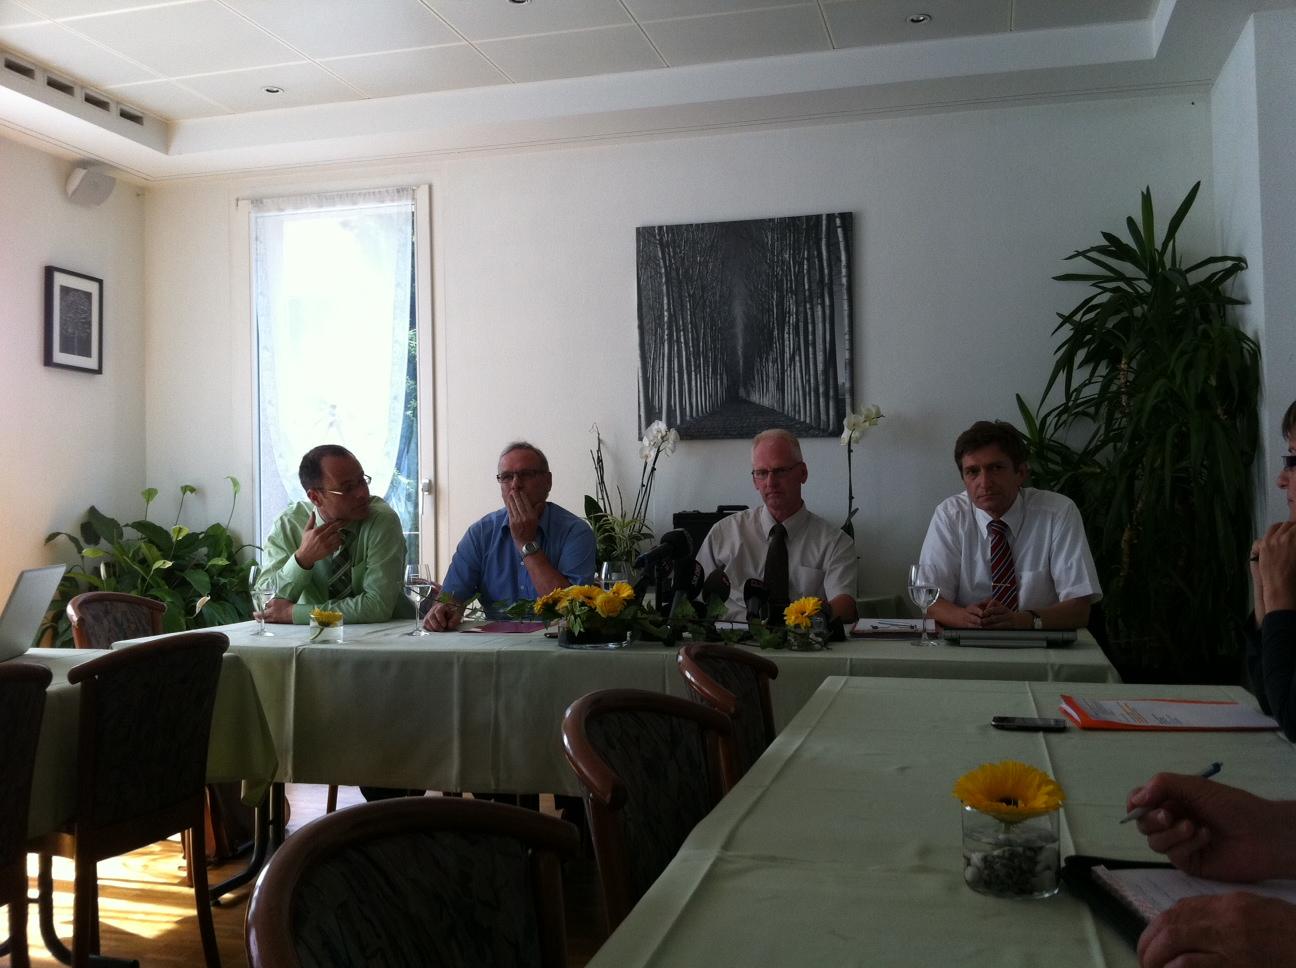 Philipp Annen, Ueli Ardüser, Beat Caluori e Markus Weidemann.